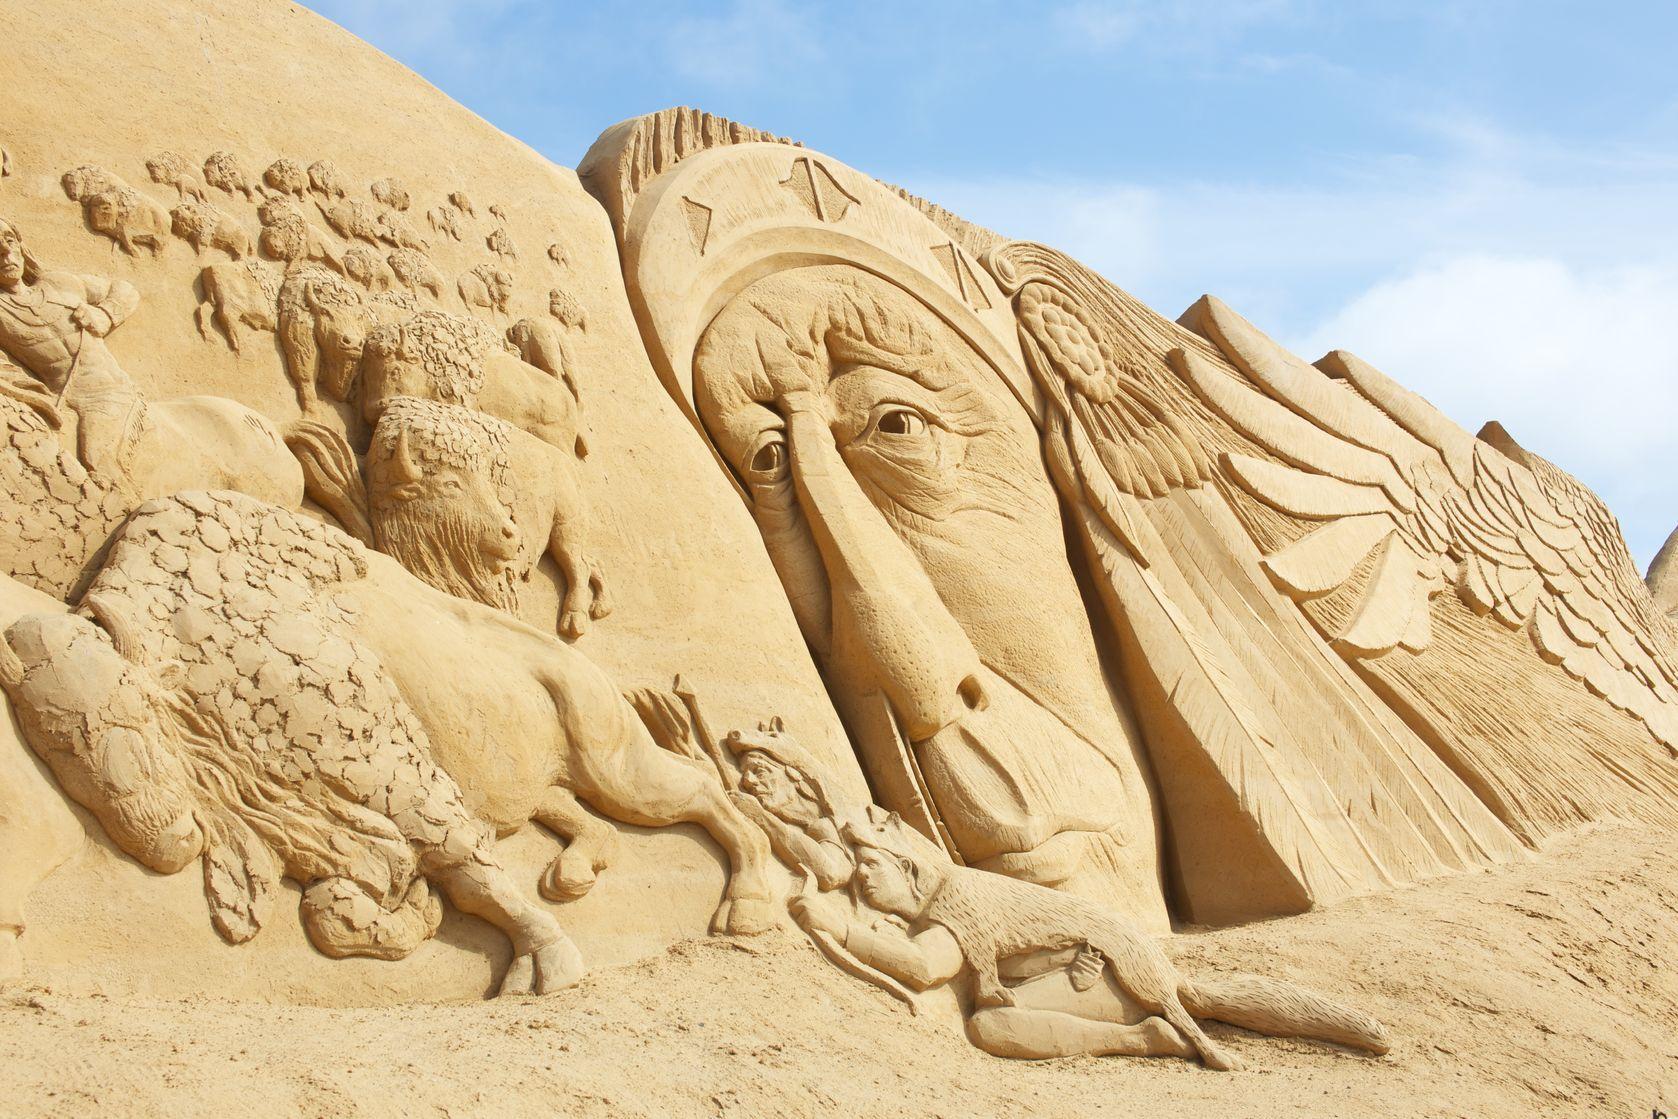 Festival de esculturas de arena de Sondervig, Dinamarca